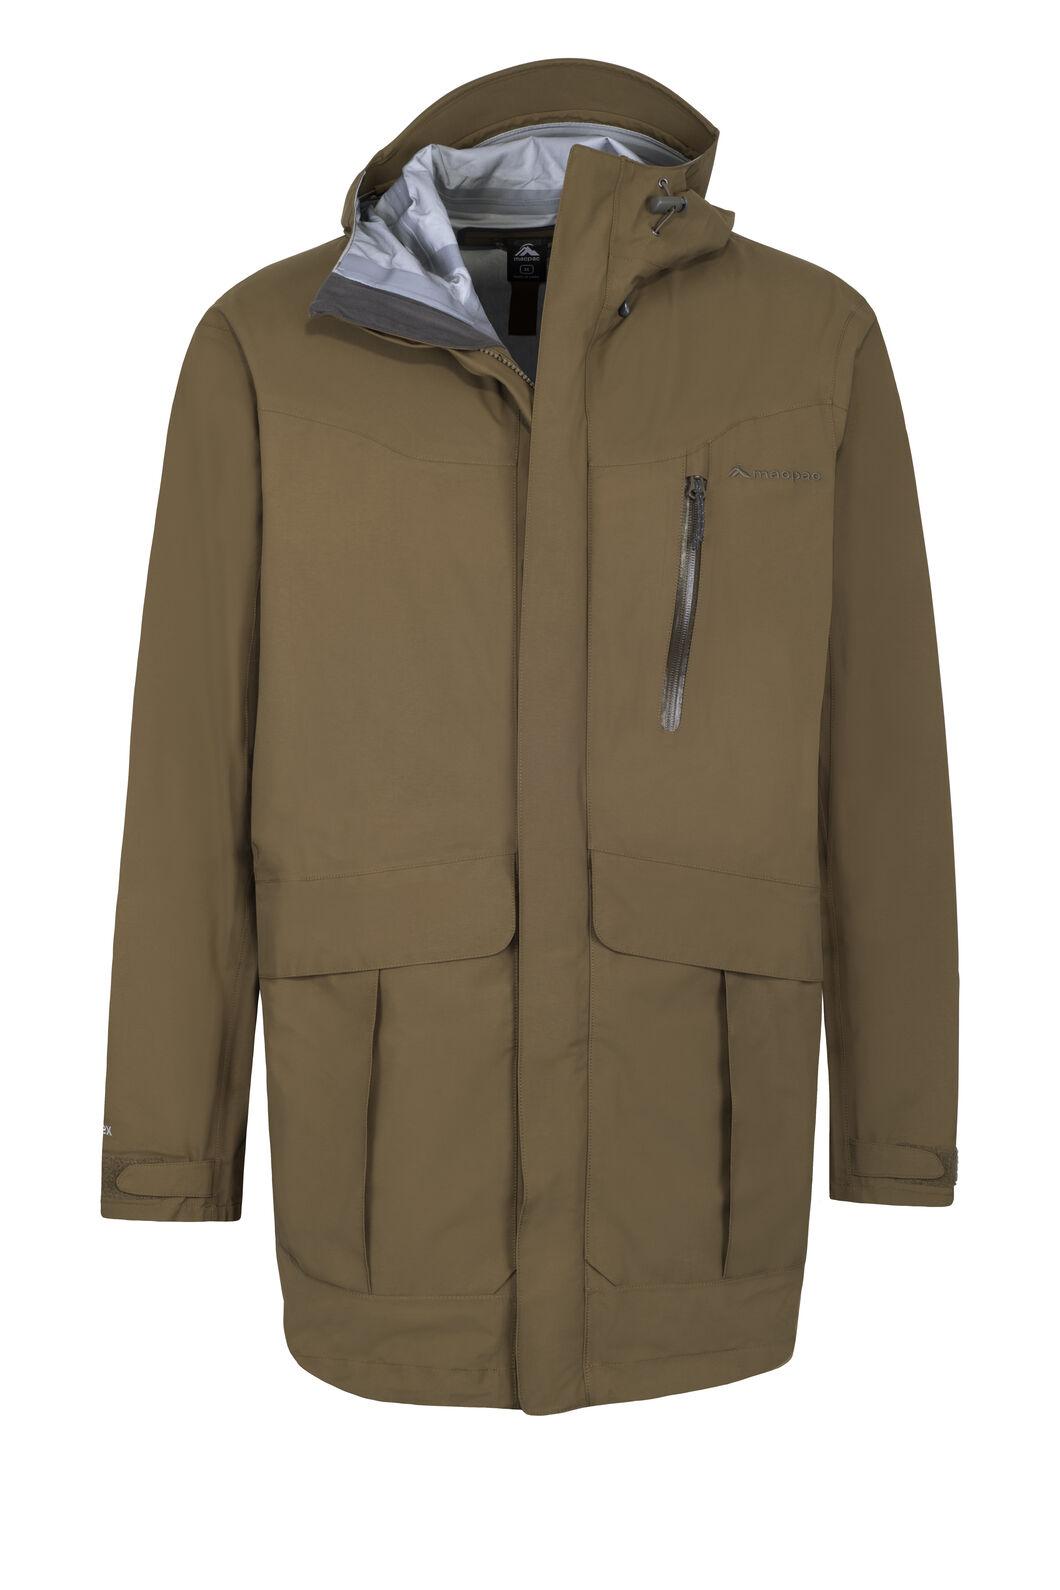 Macpac Men's Copland Long Rain Jacket, Military Olive, hi-res